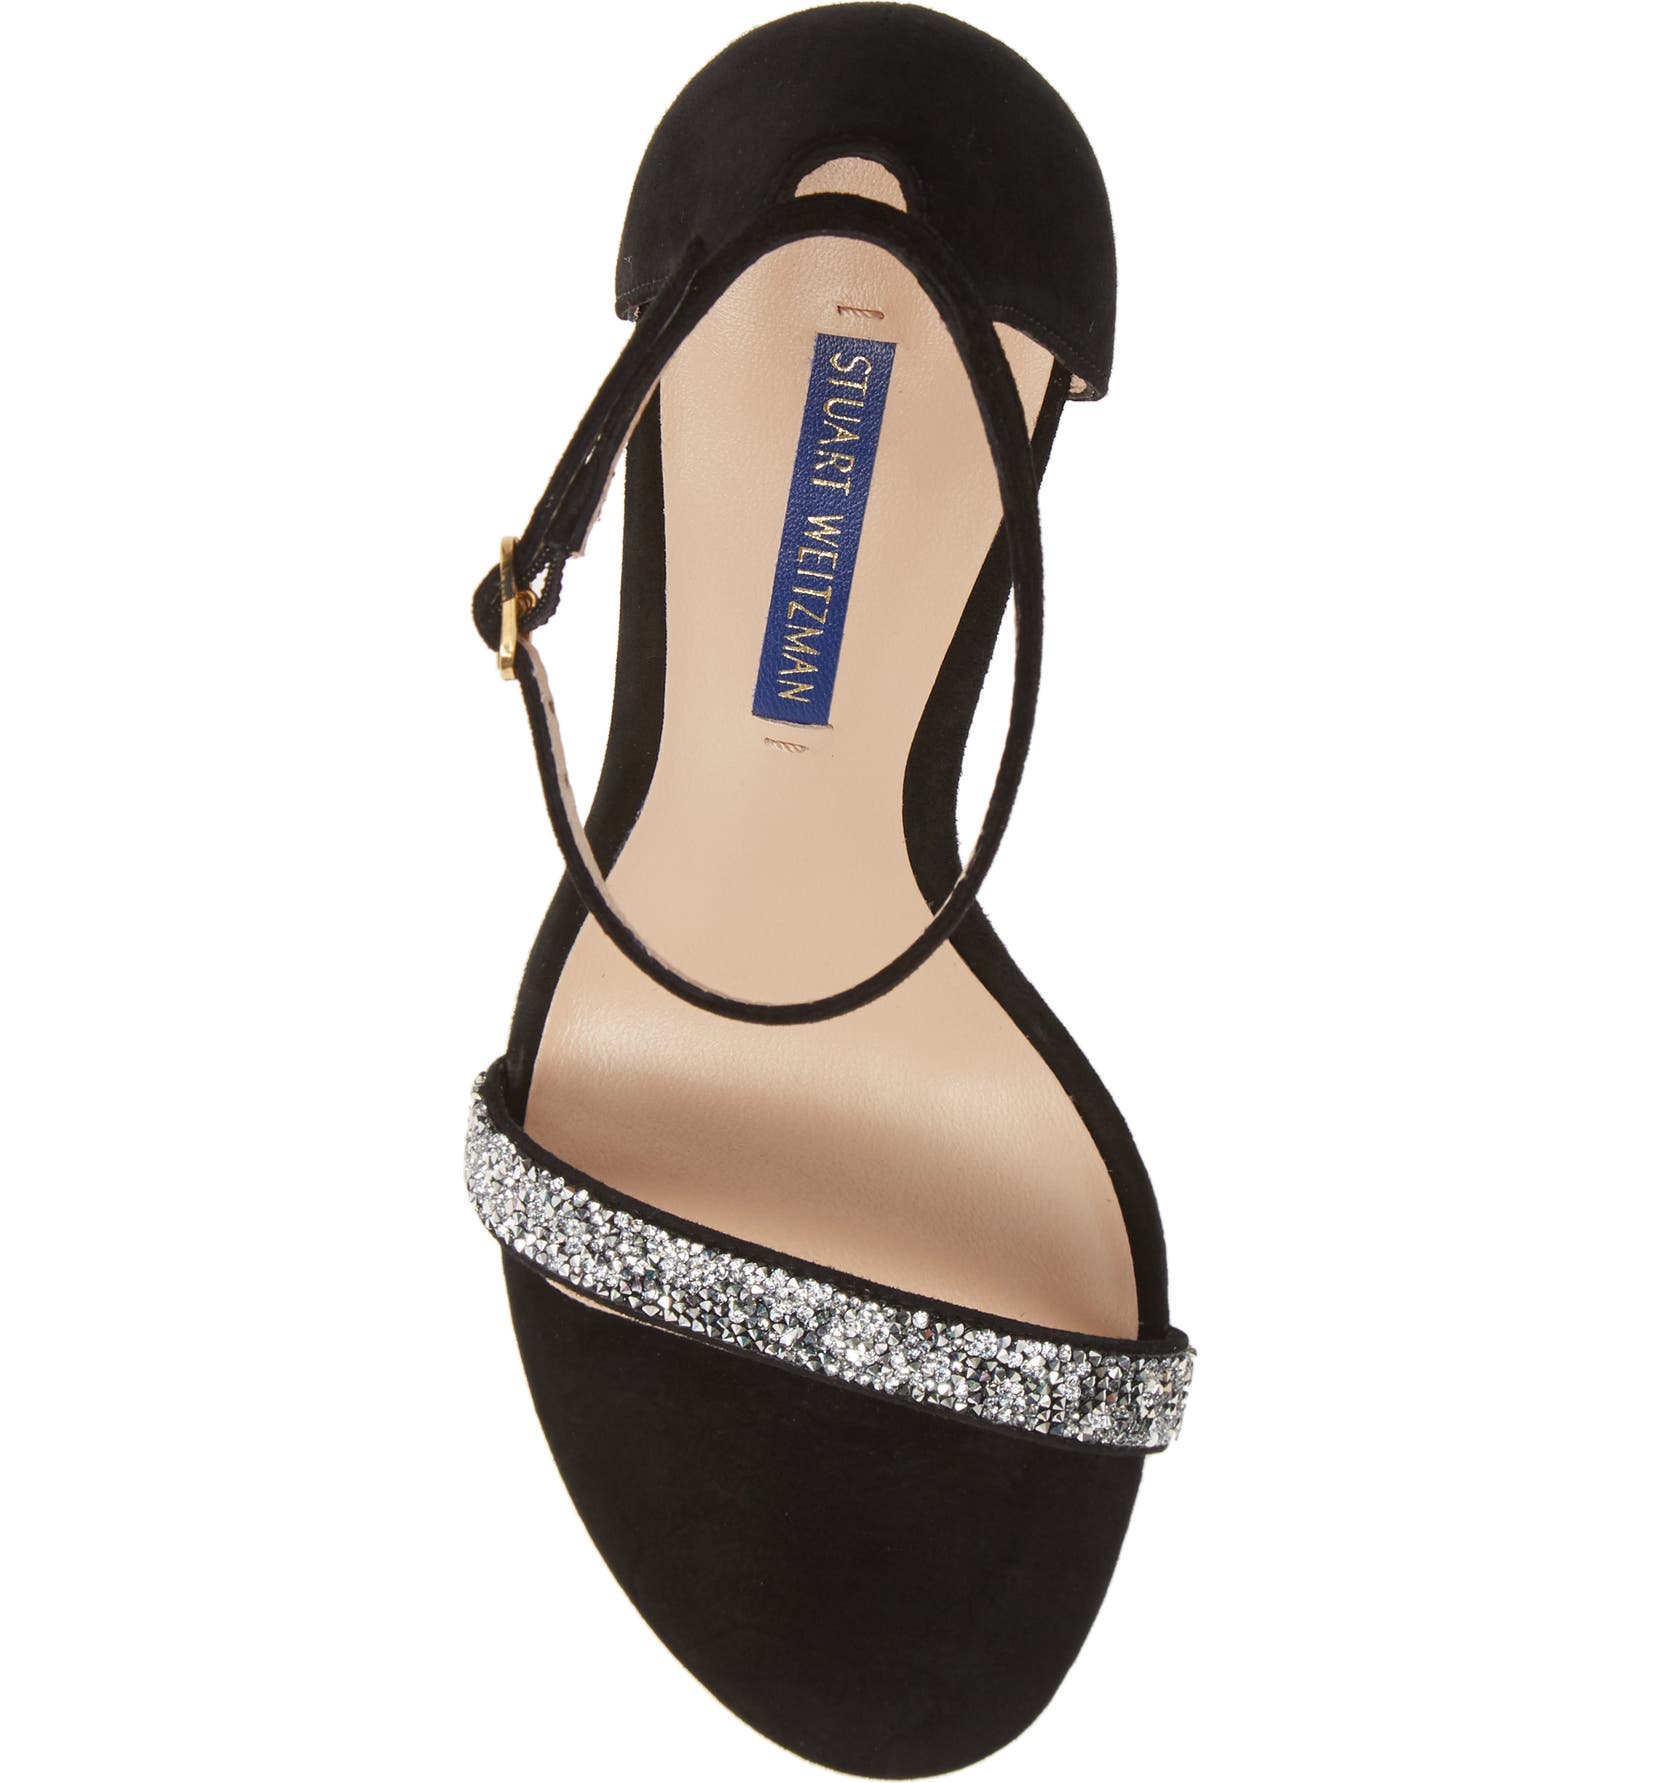 71d2d1af6783 Stuart Weitzman Nudistsong Ankle Strap Sandal (Women)